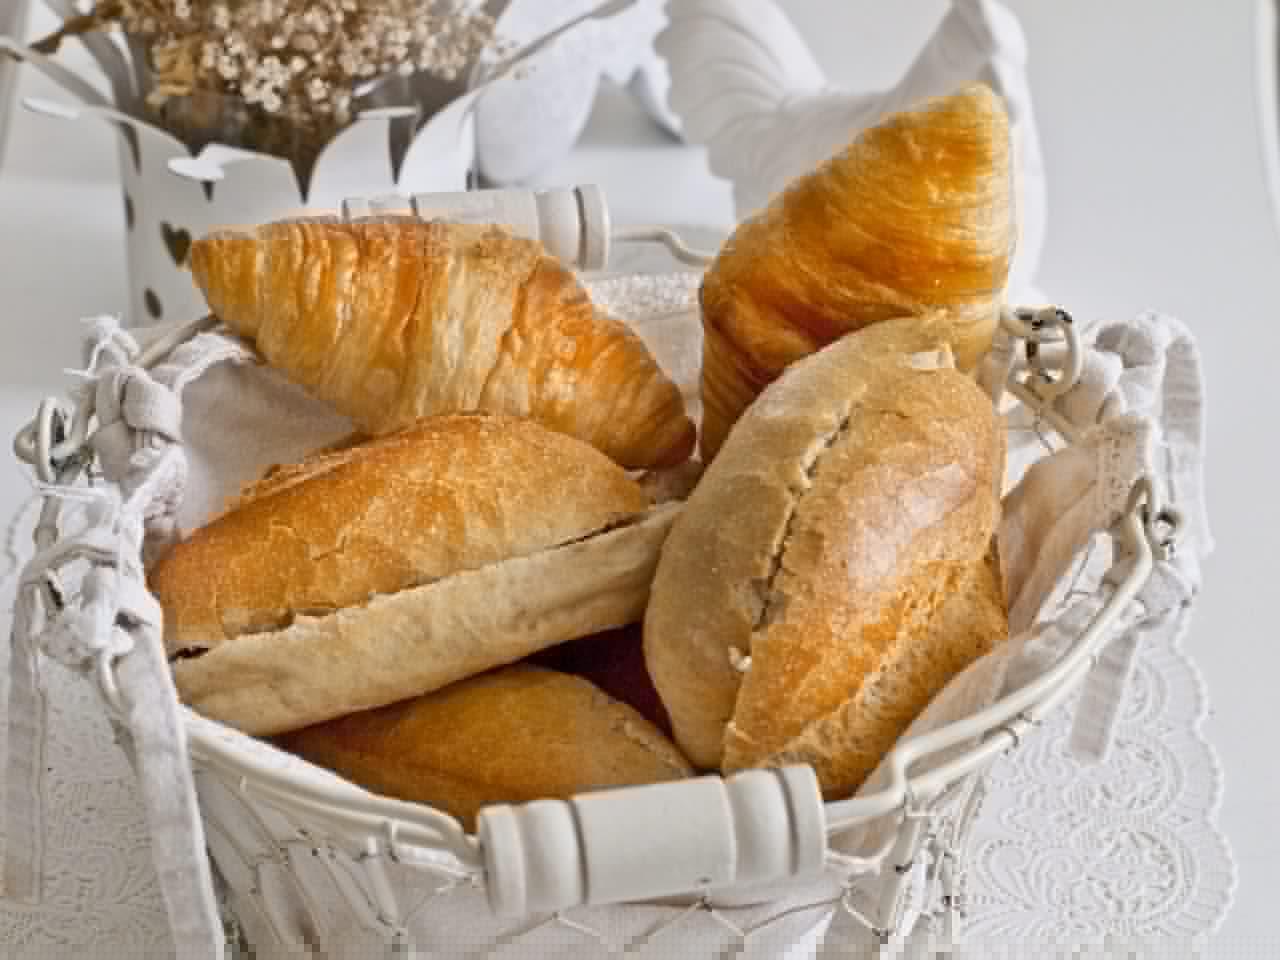 11 motivos para largar o trigo e o glúten